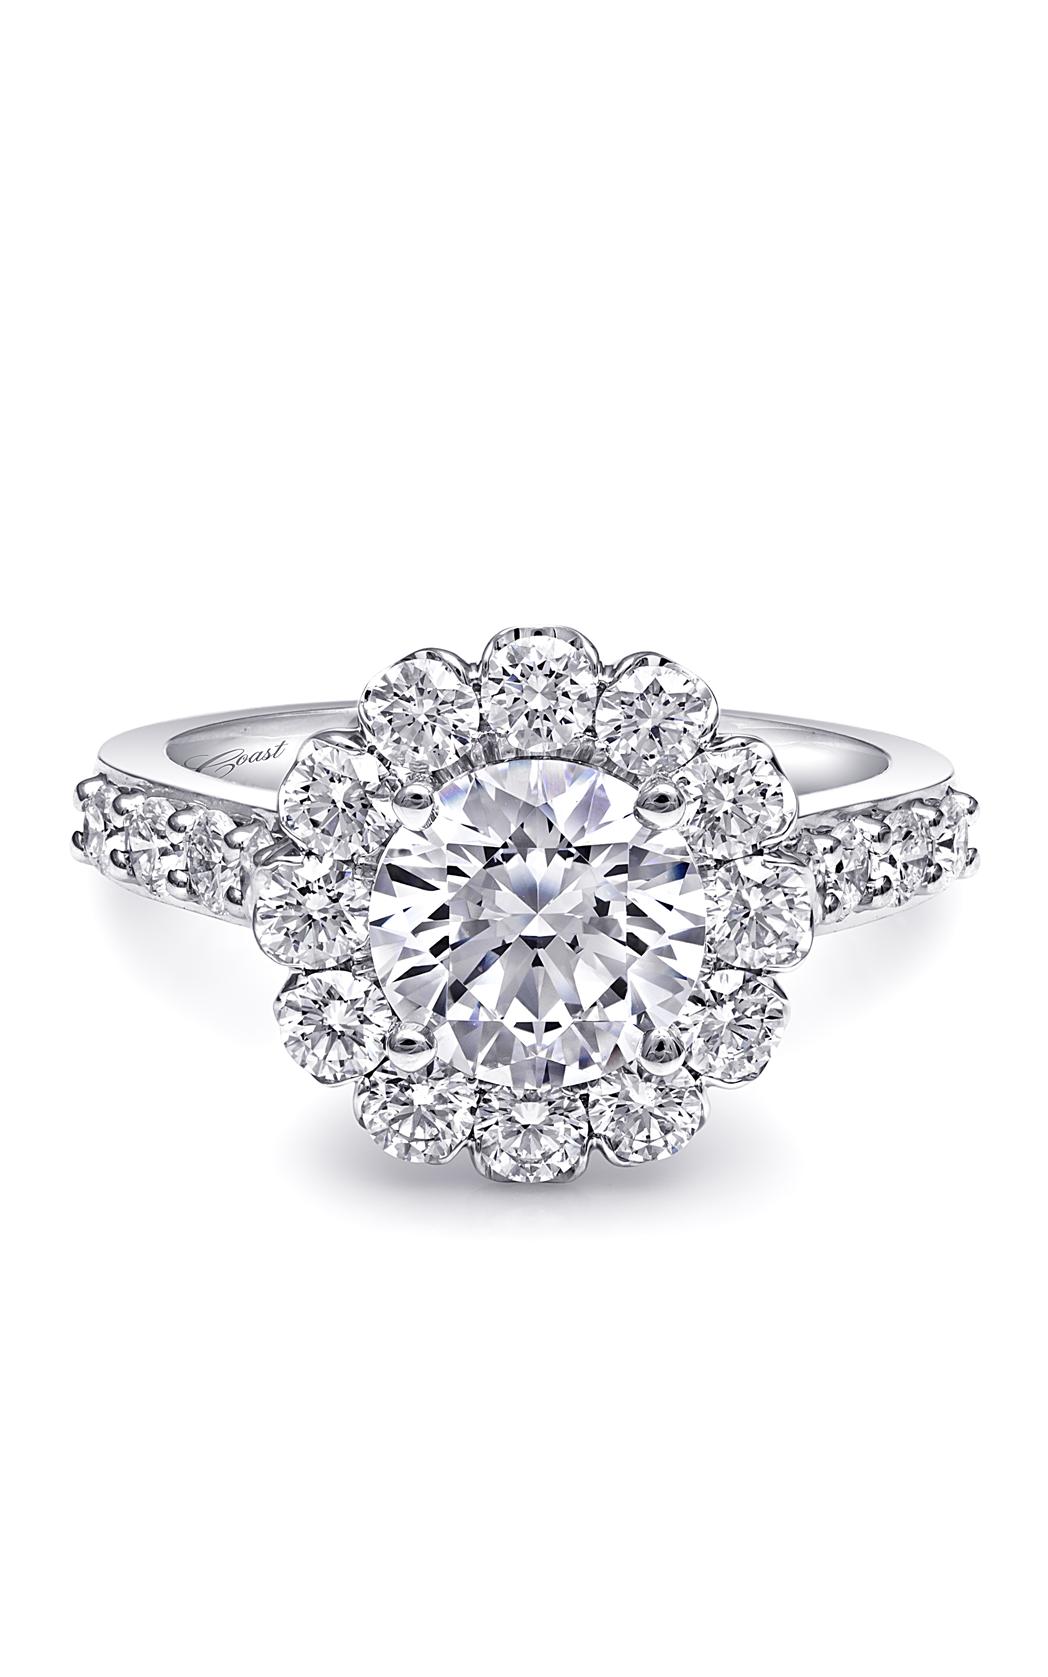 Coast Diamond Charisma LS10133 product image